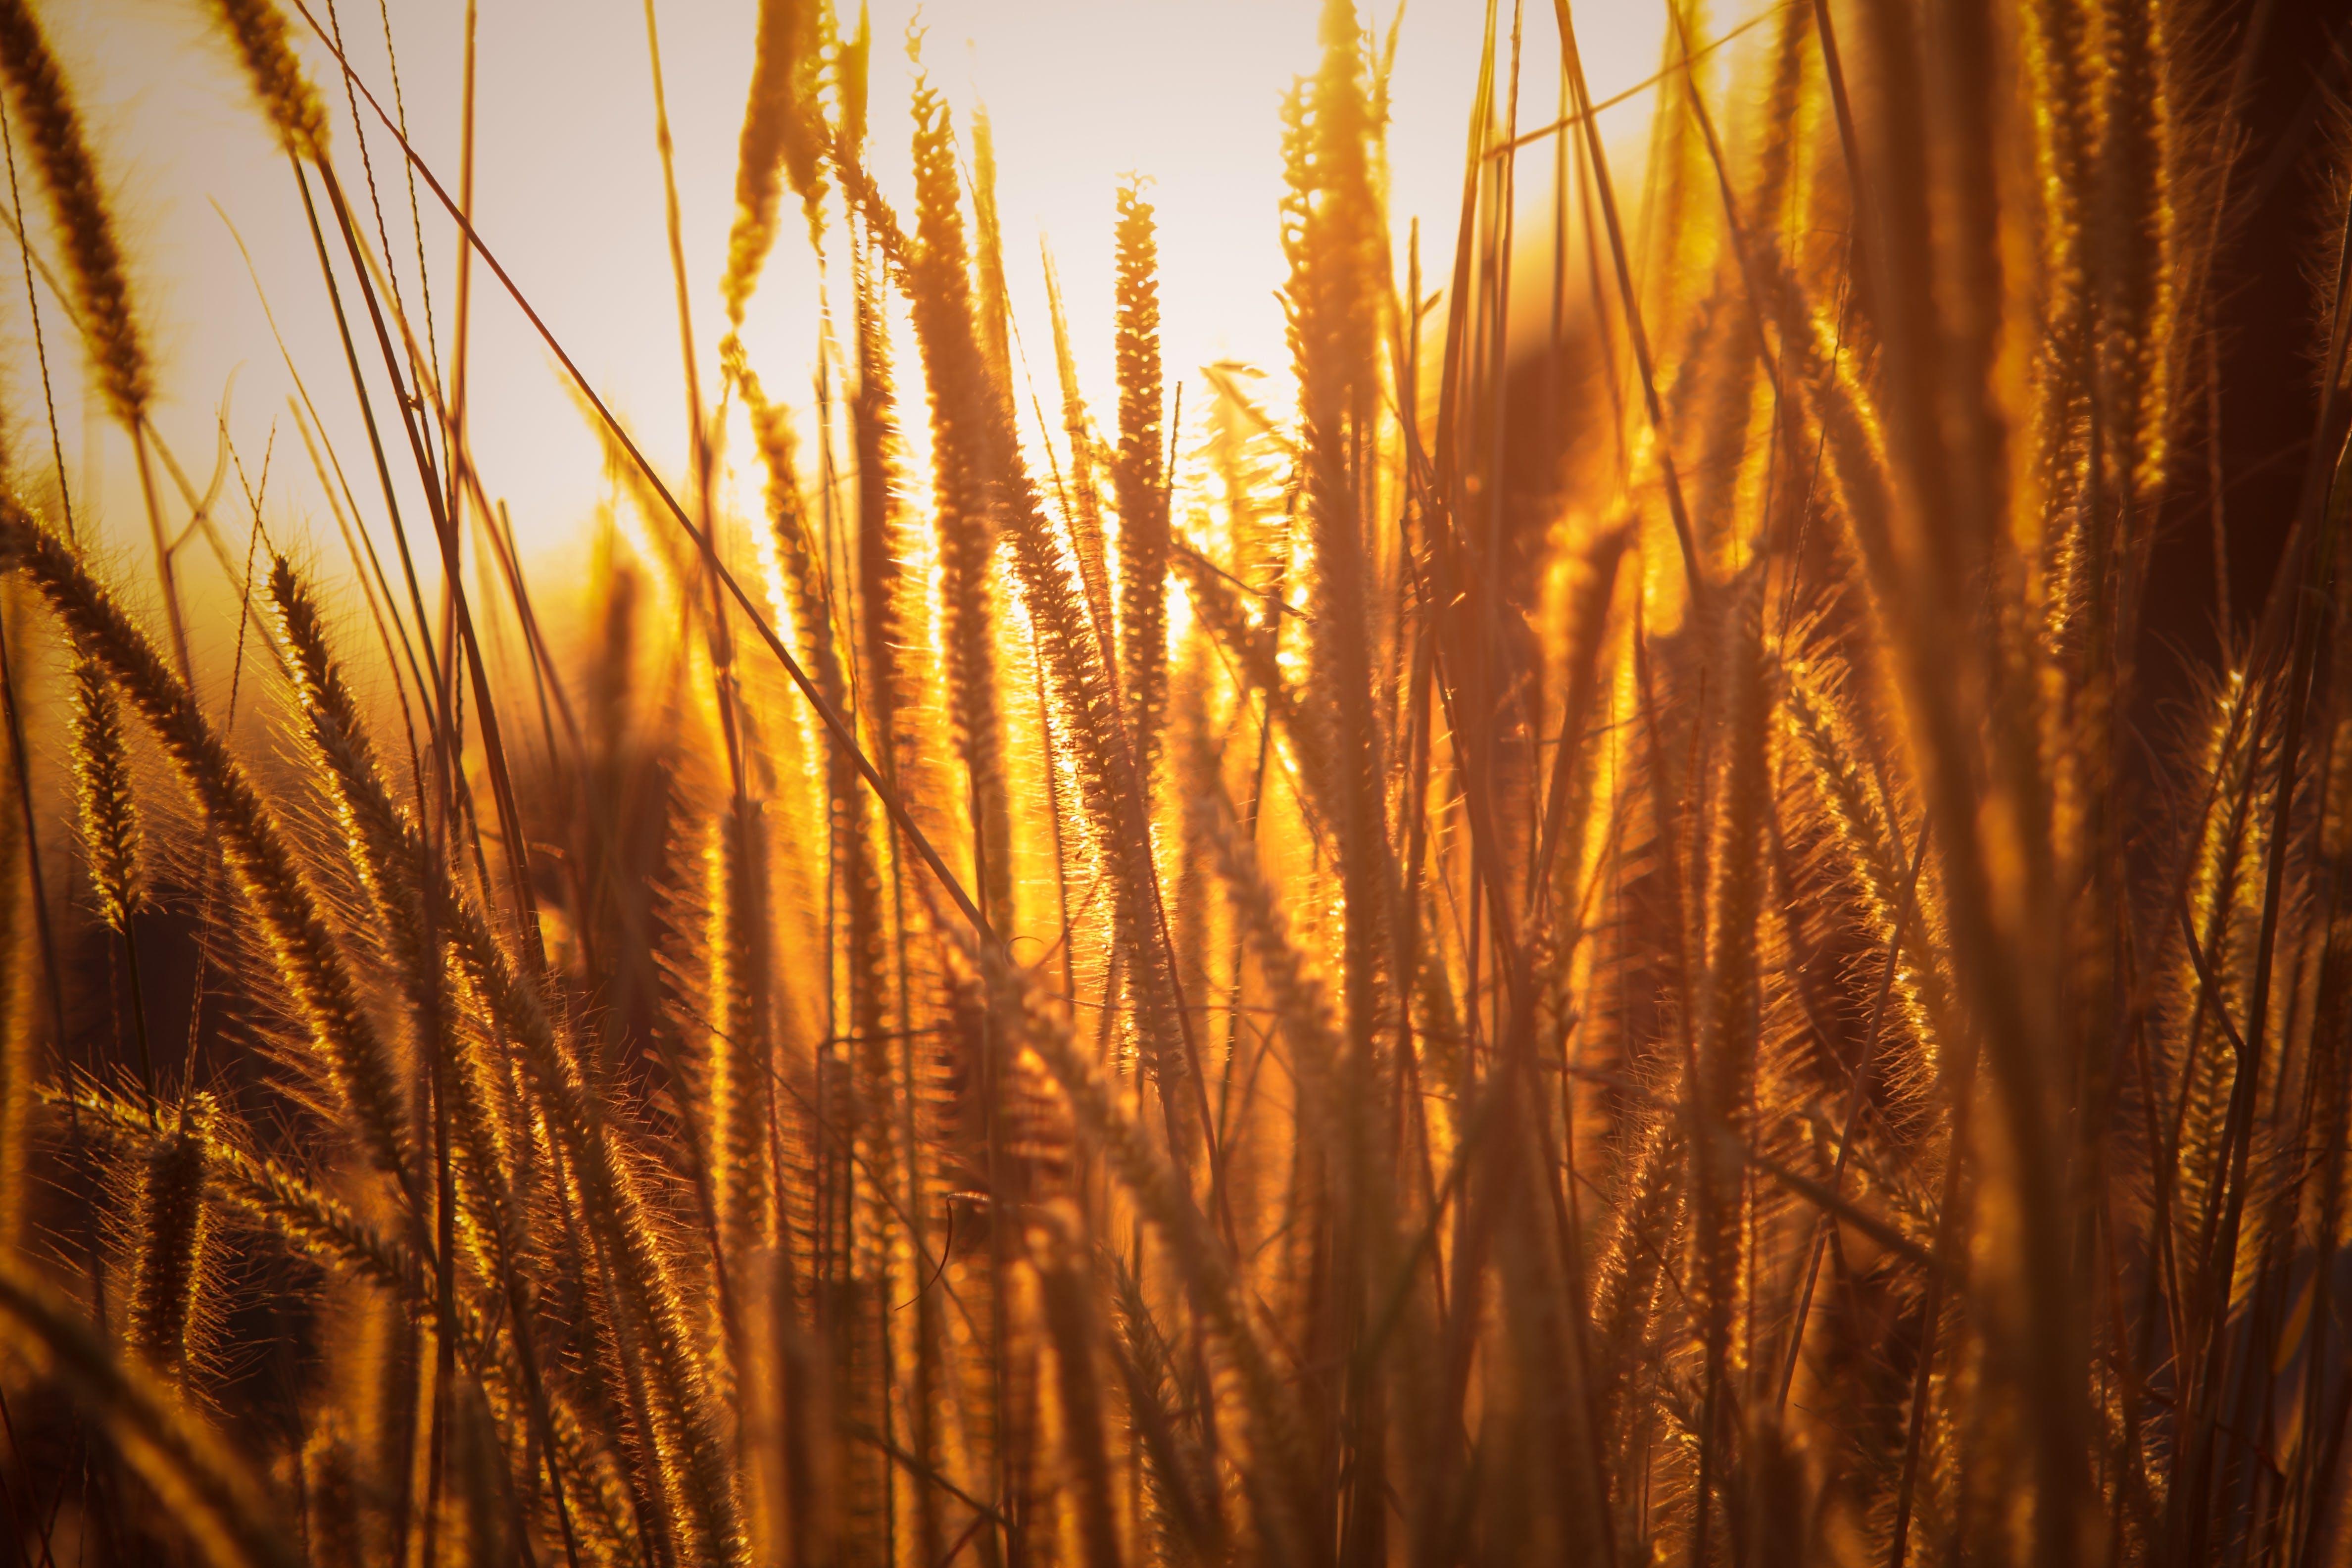 Brown Rice Wheats